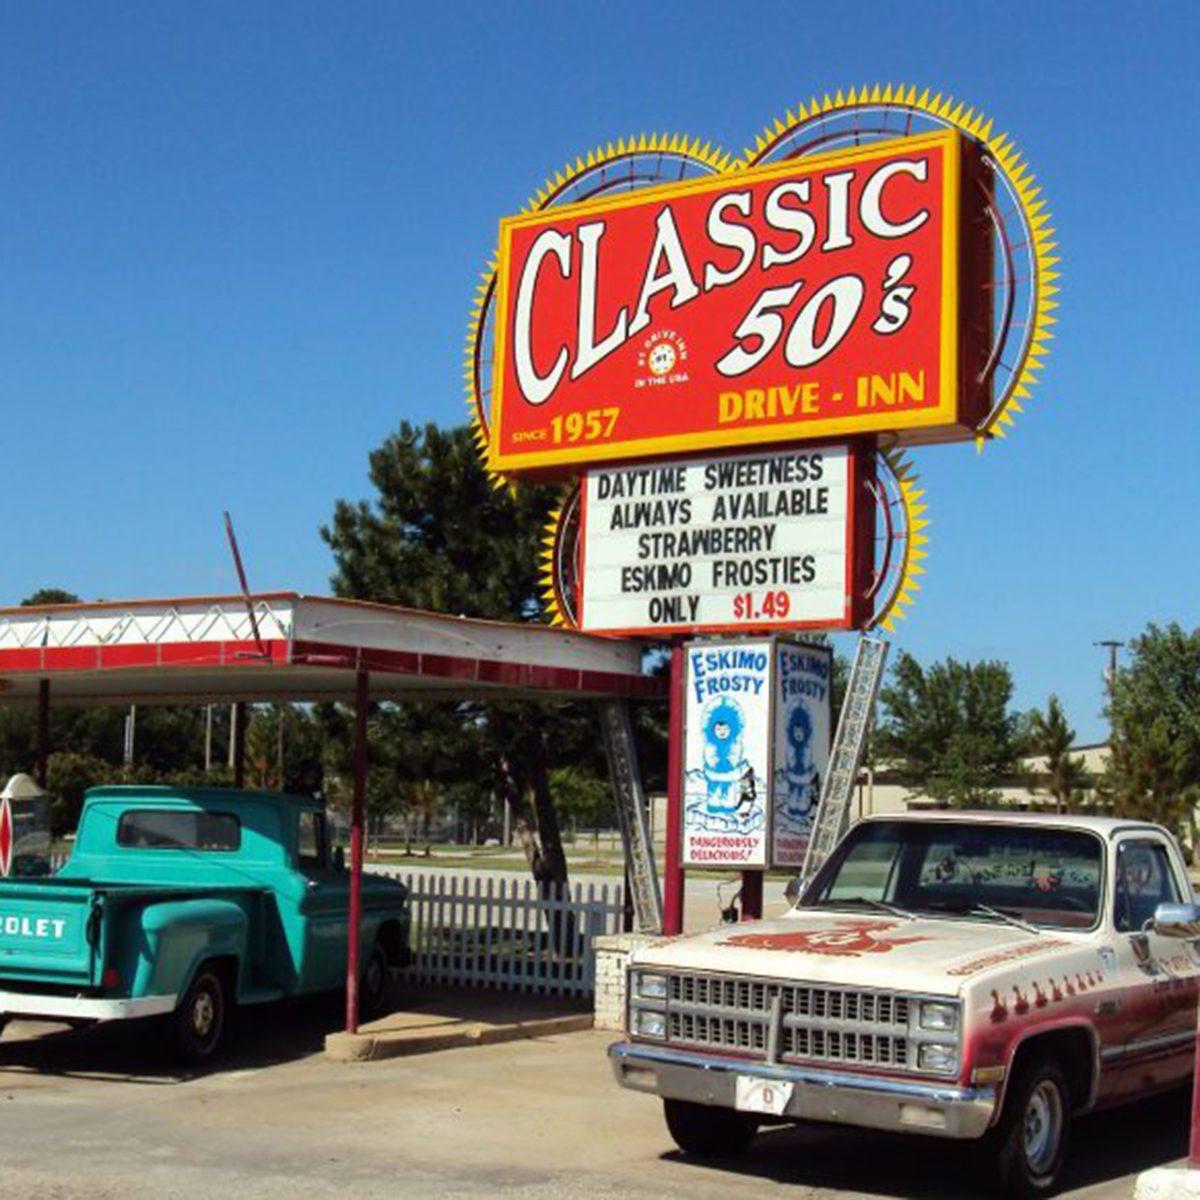 CLASSIC 50'S DRIVE-INN